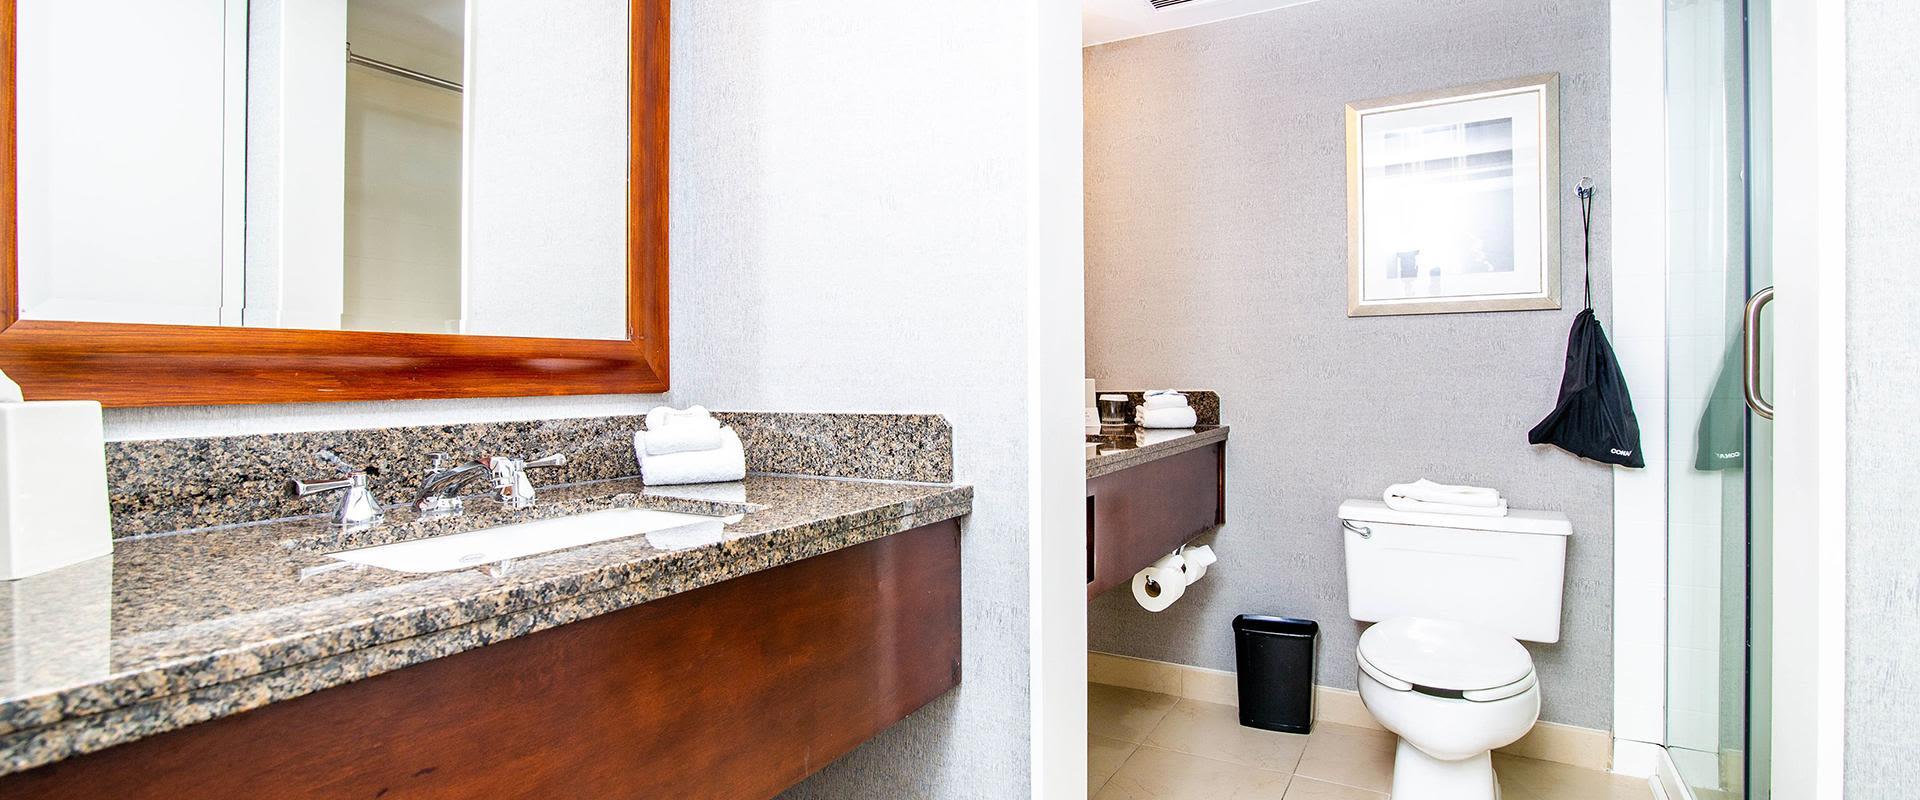 Charlotte Hotel Guest Bathroom Double Sinks